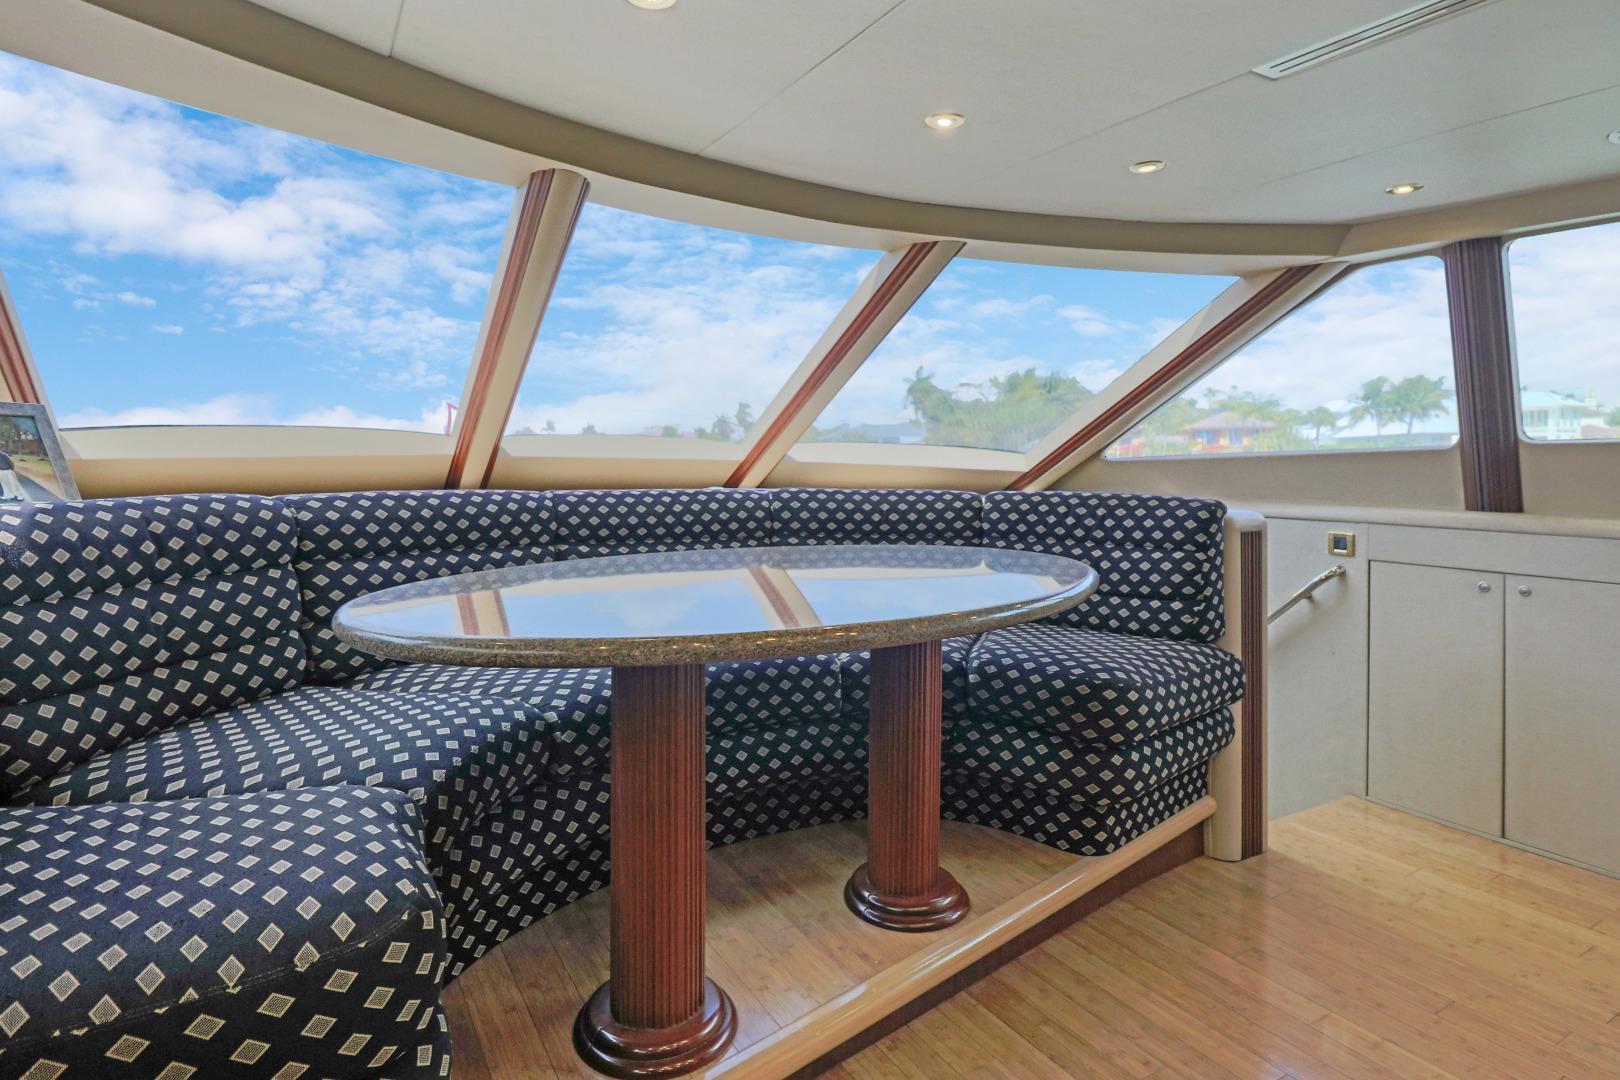 Lazzara-Sky Lounge 2002-Sea Bear Florida-United States-1419745   Thumbnail